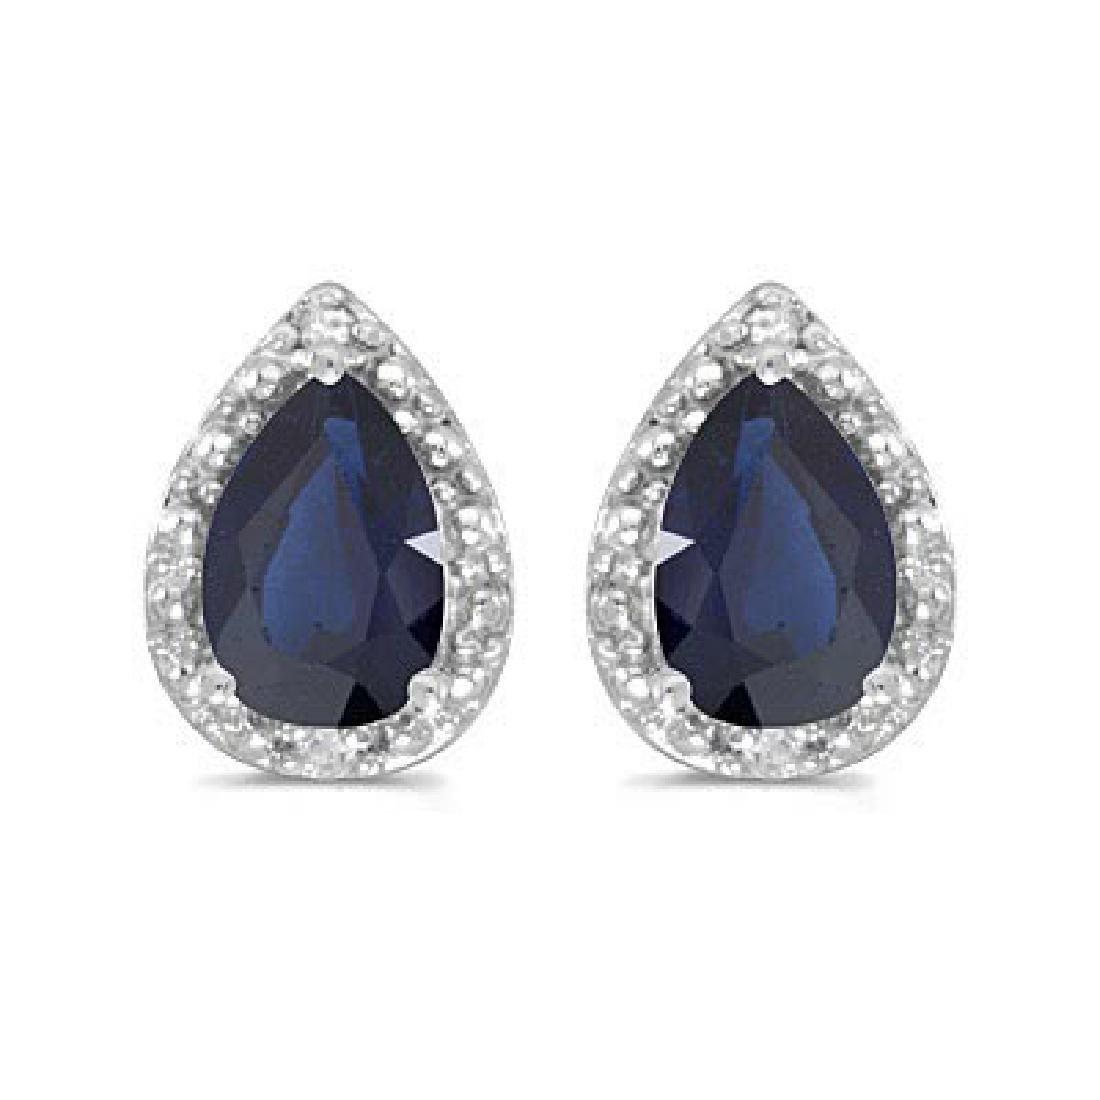 Pear Blue Sapphire and Diamond Stud Earrings 14k White